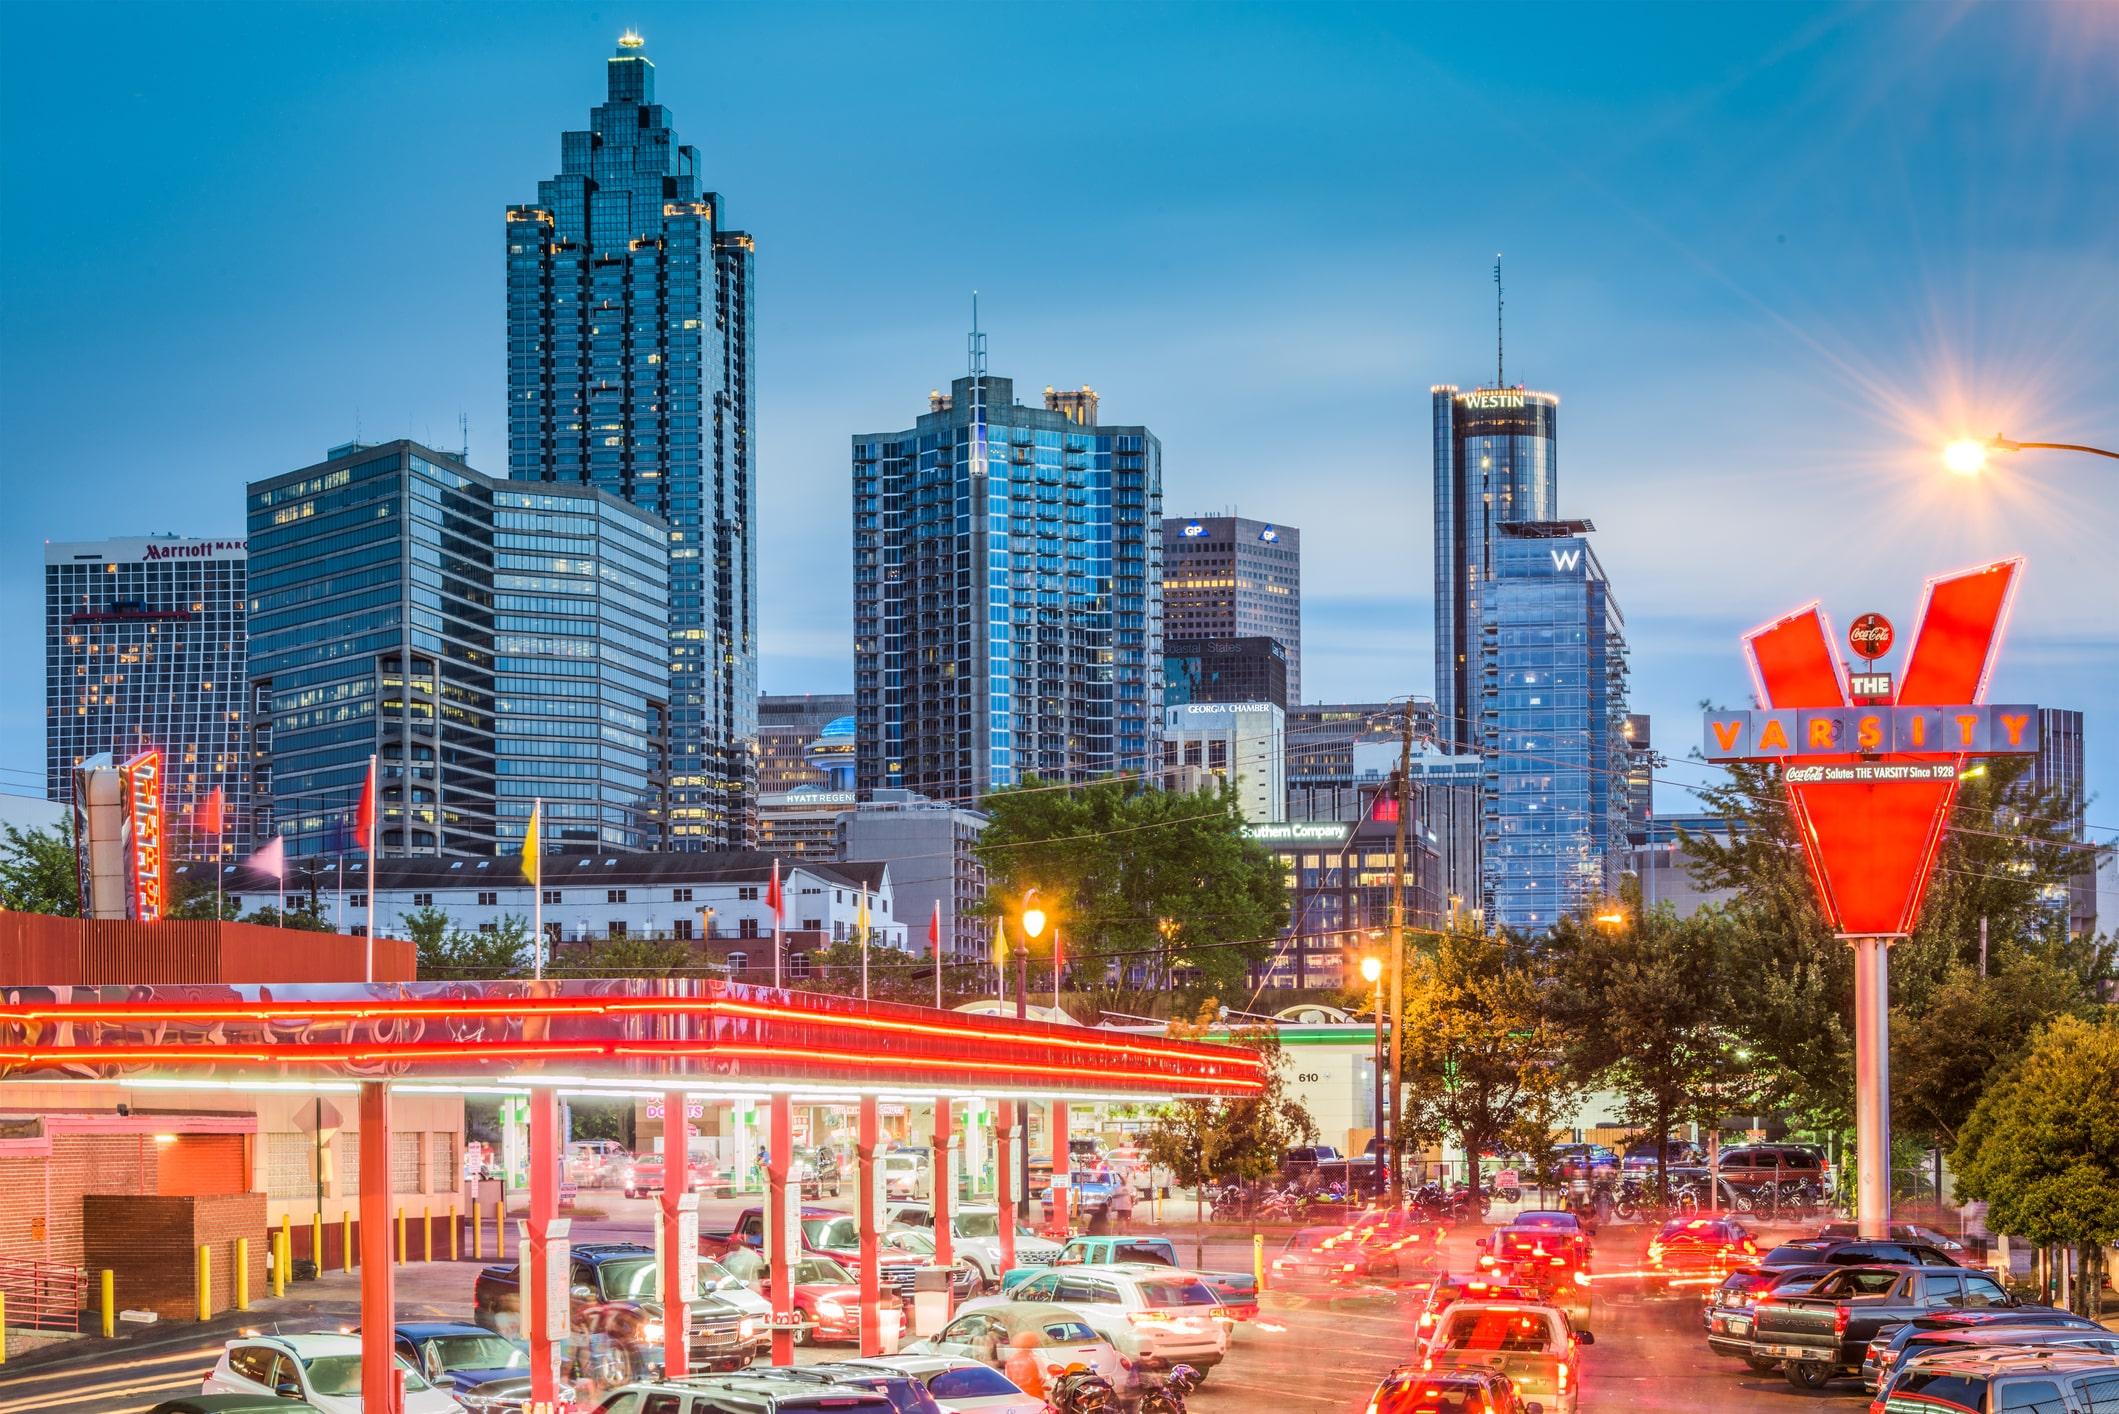 citybizlist : Washington DC : FCP Announces $71.1M ... |Workforce Atlanta Metropolitan Area